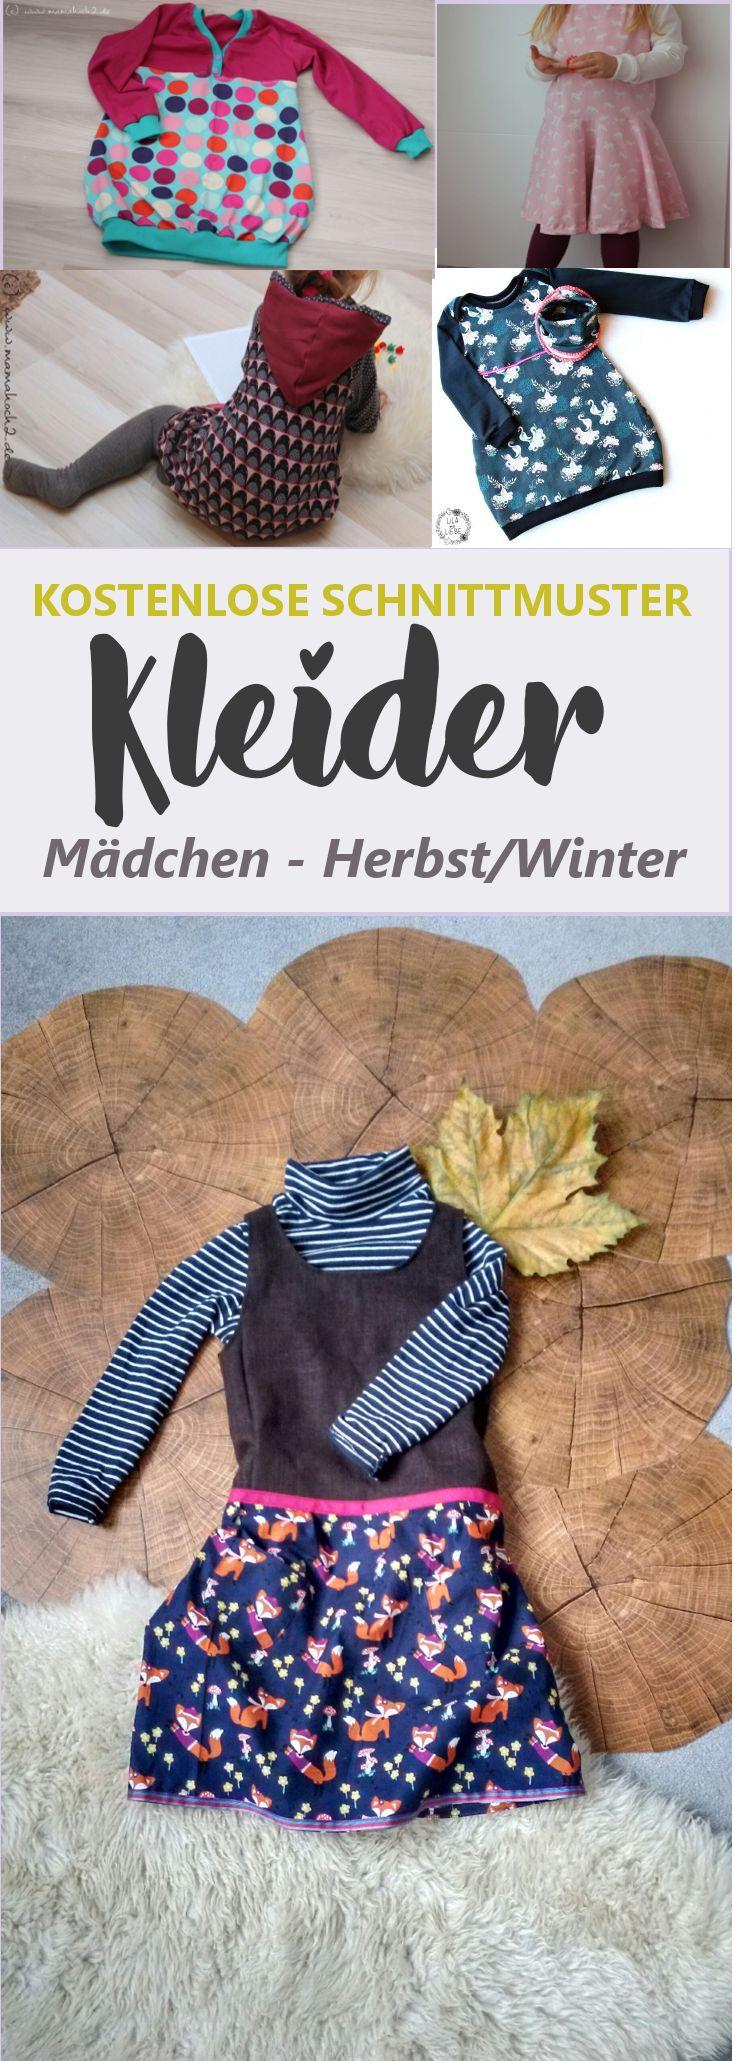 Schnittmuster Kleid Mädchen kostenlos | Herbst/Winter • eager self